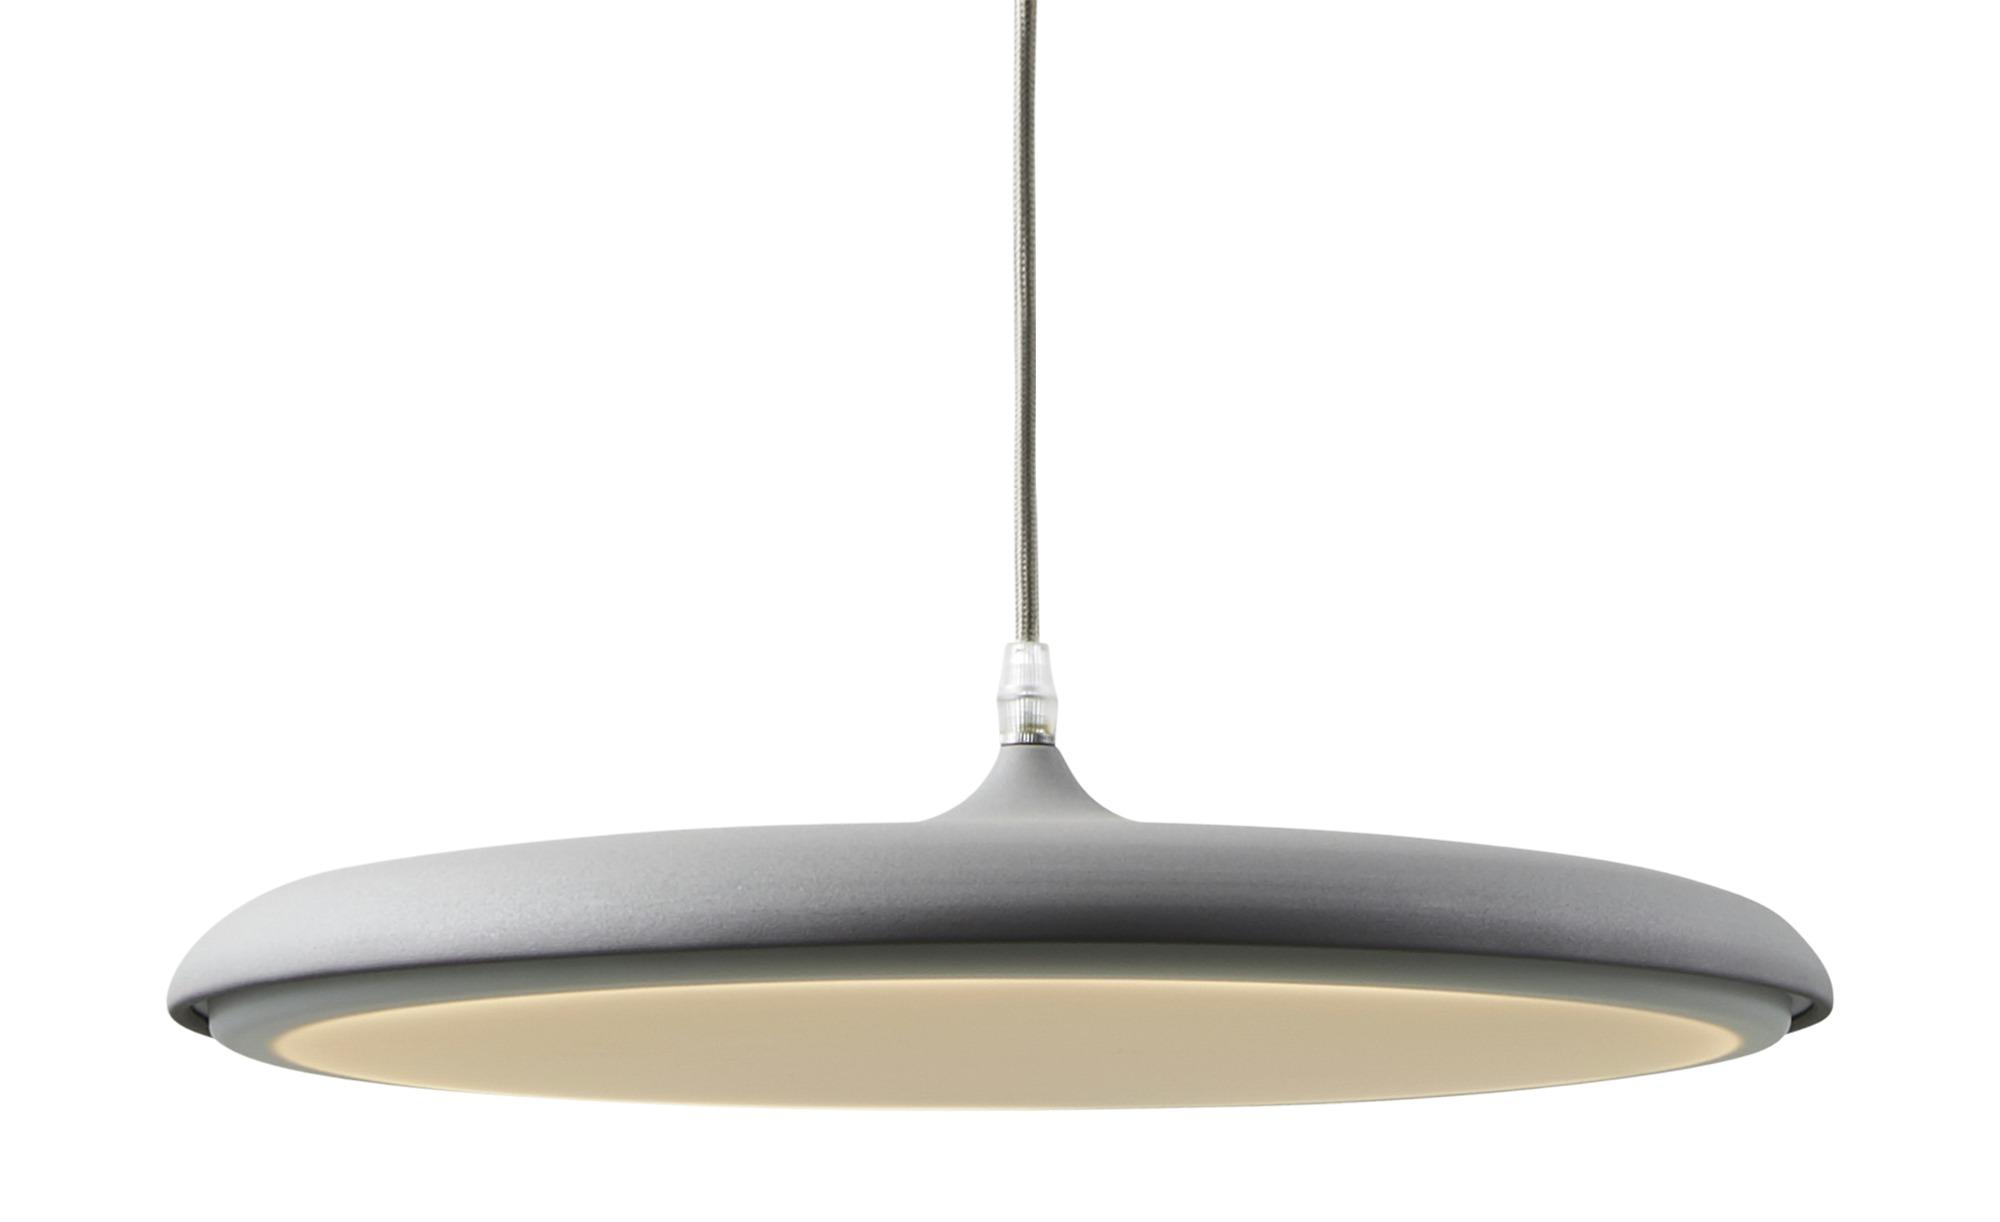 KHG LED-Pendelleuchte, 1-flammig, Grau ¦ grau ¦ Maße (cm): H: 150 Ø: [40.0] Lampen & Leuchten > LED-Leuchten > LED-Pendelleuchten - Höffner